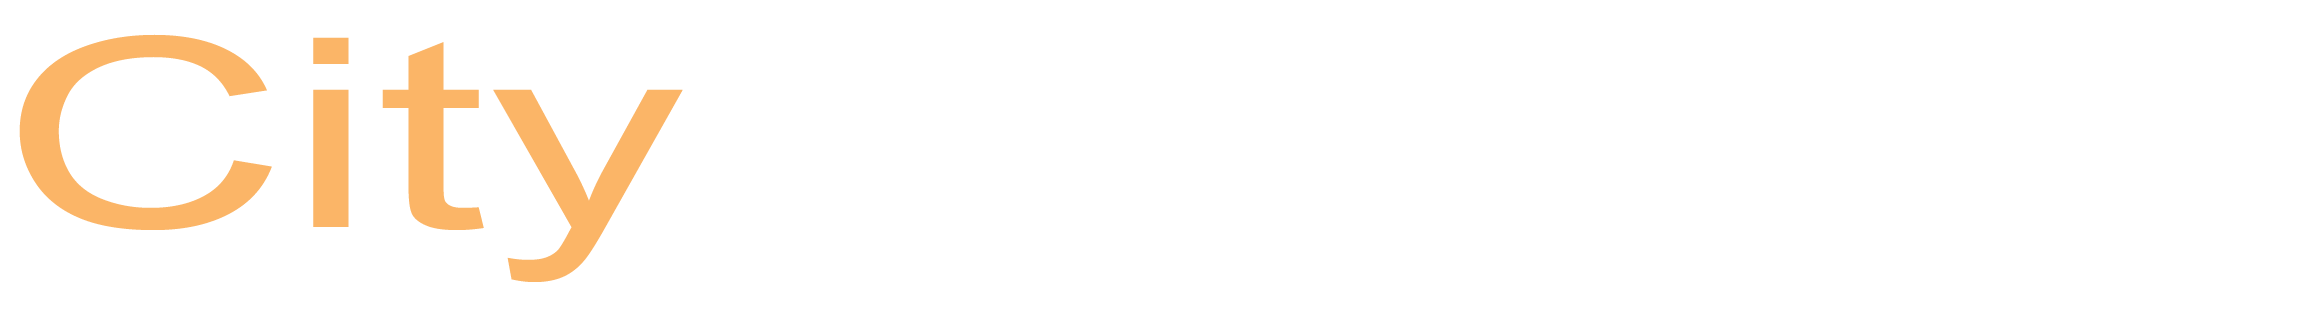 CityStructure long logo